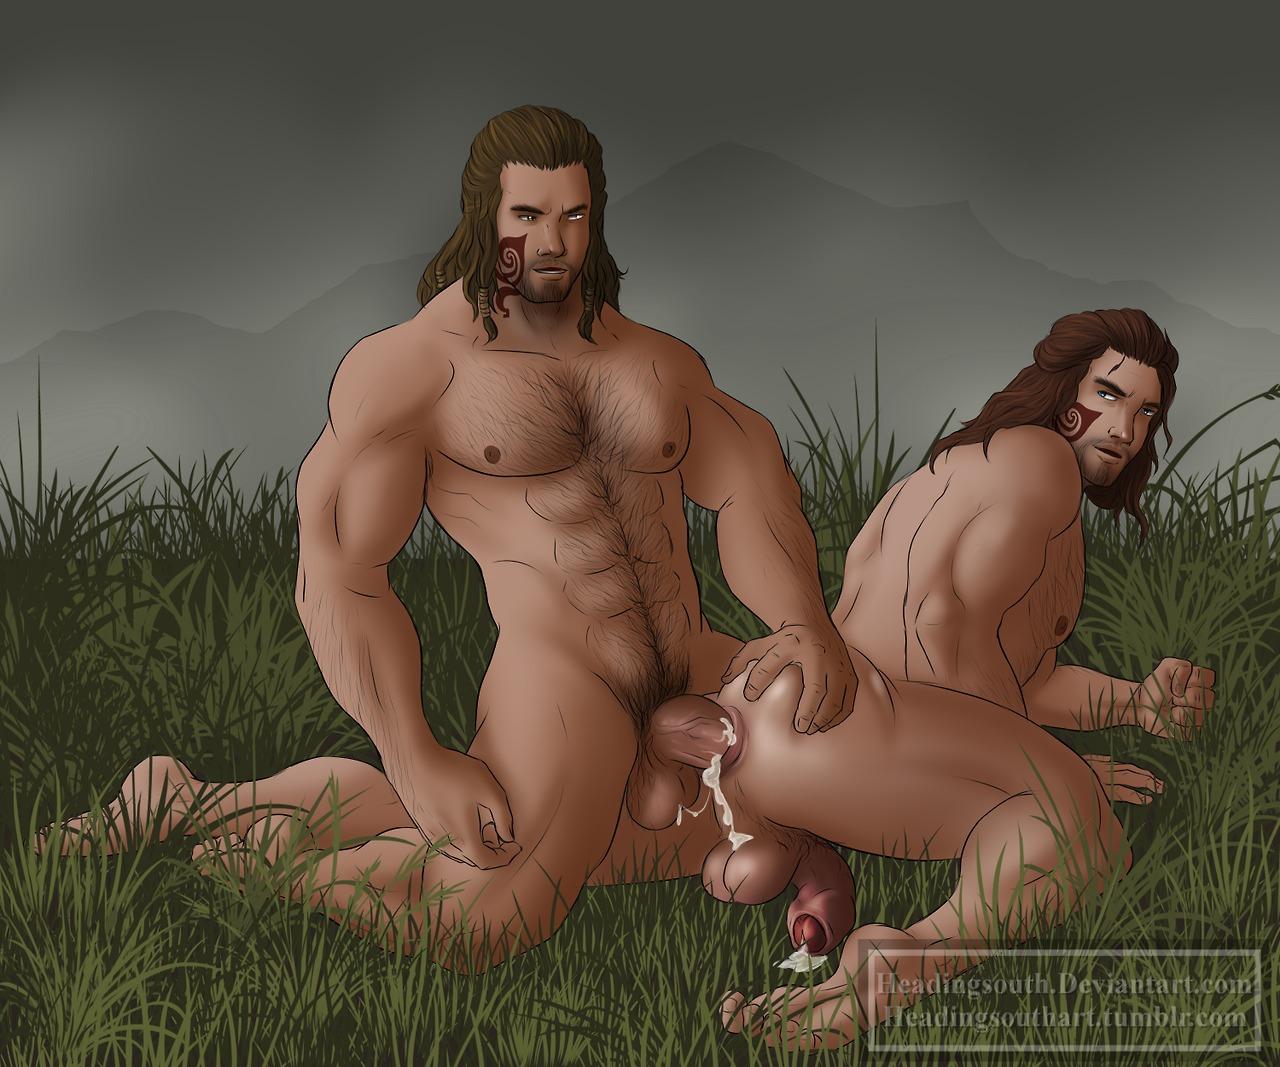 Elder scrolls porn tumblr naked boobs